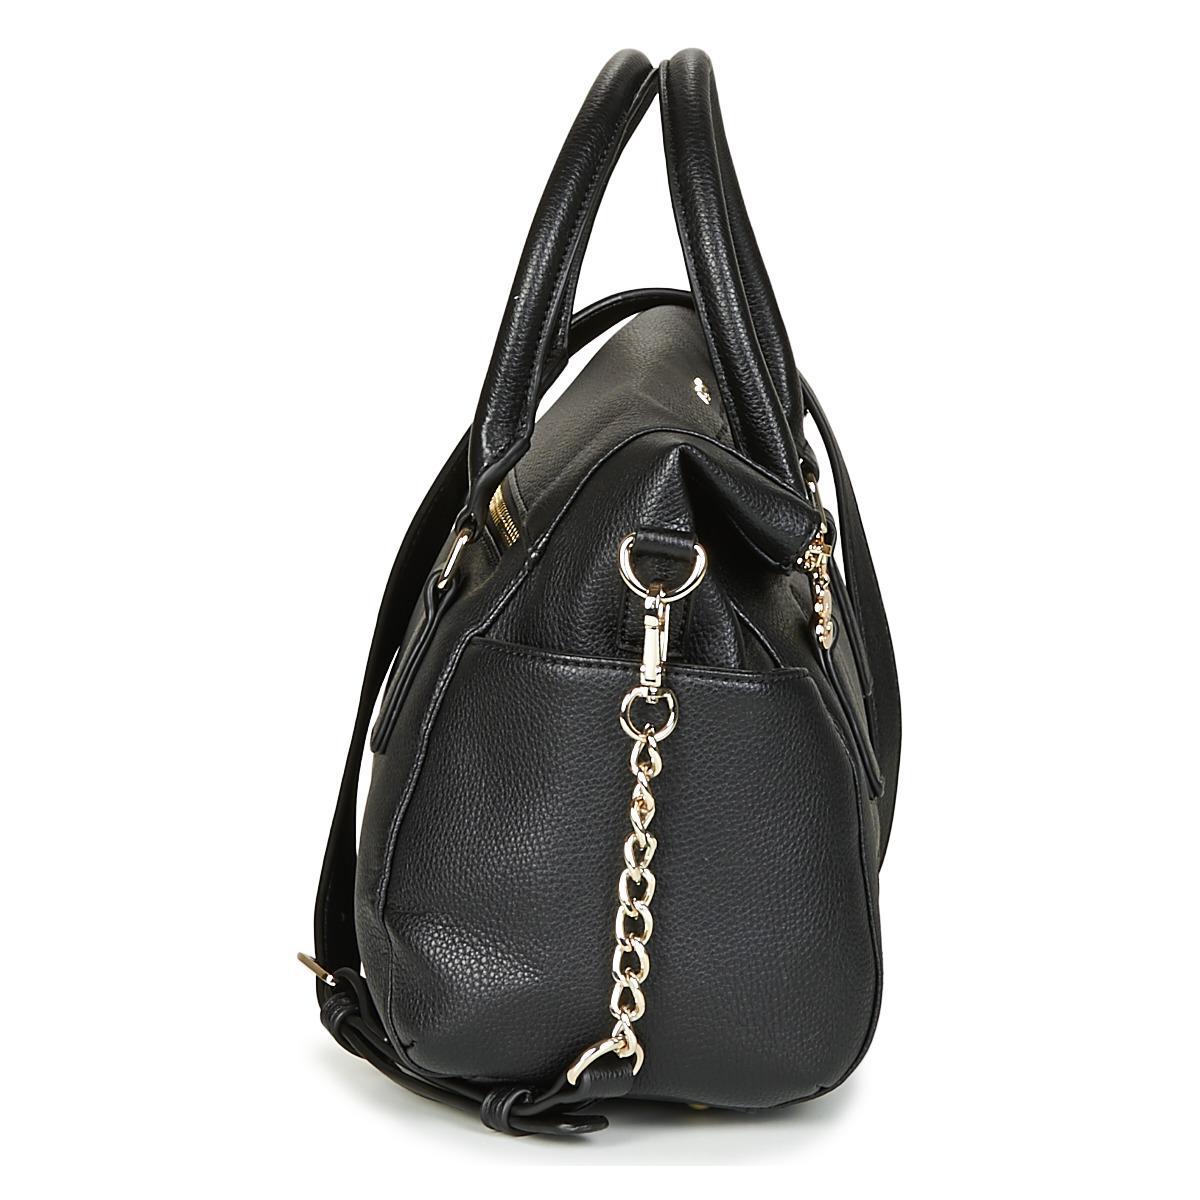 0e2449ec163 Desigual Bols Dark Amber Loverty Women s Handbags In Black in Black ...